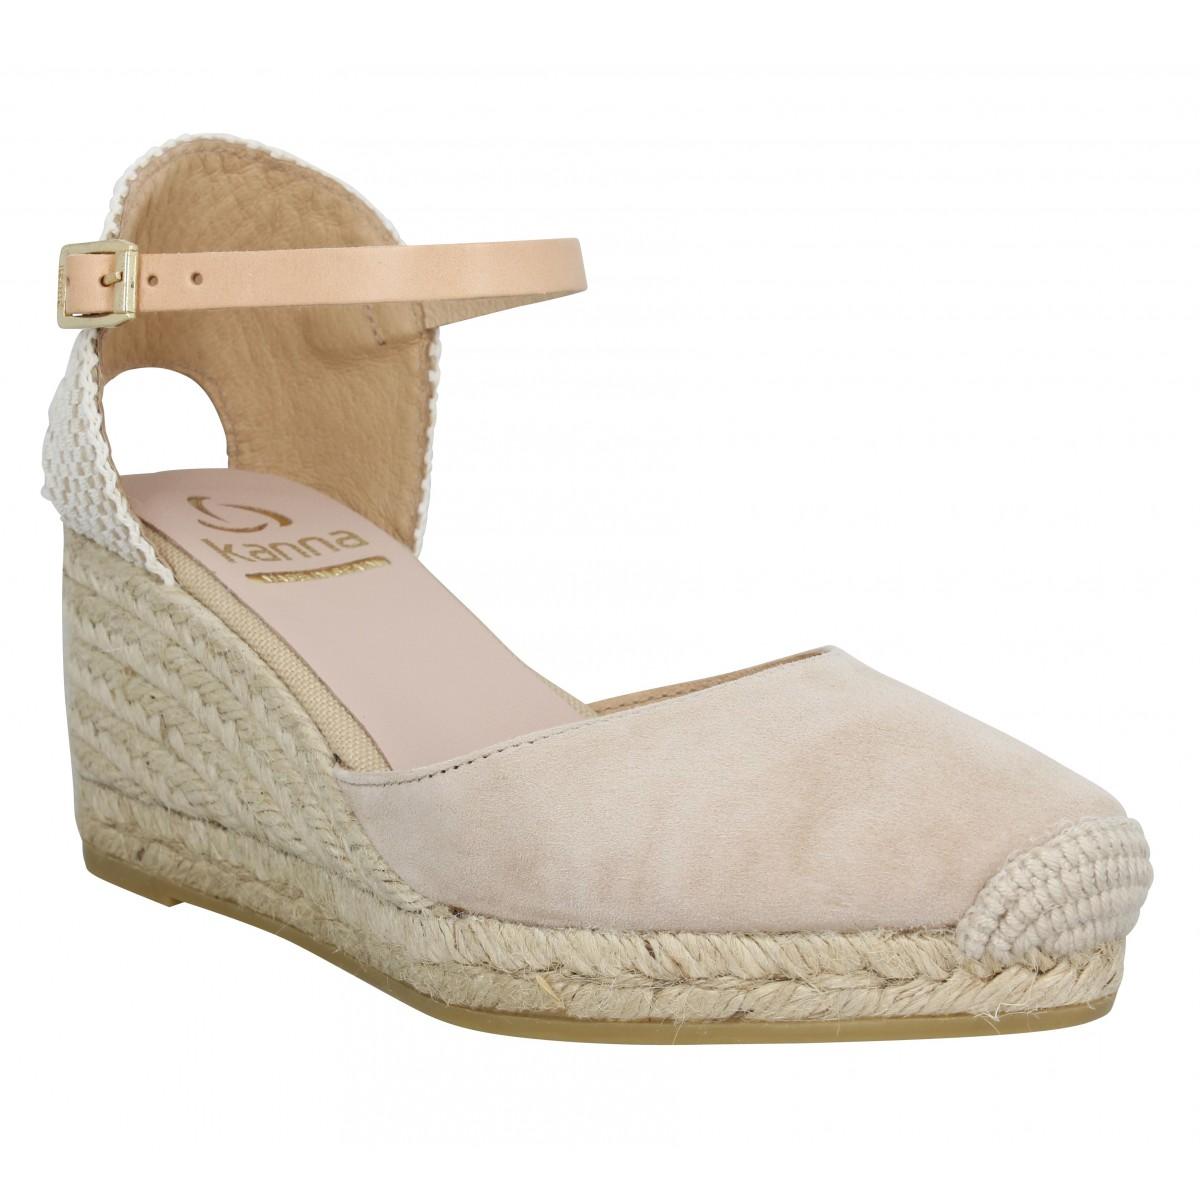 Sandales talons KANNA 9211 velours Femme Ecru